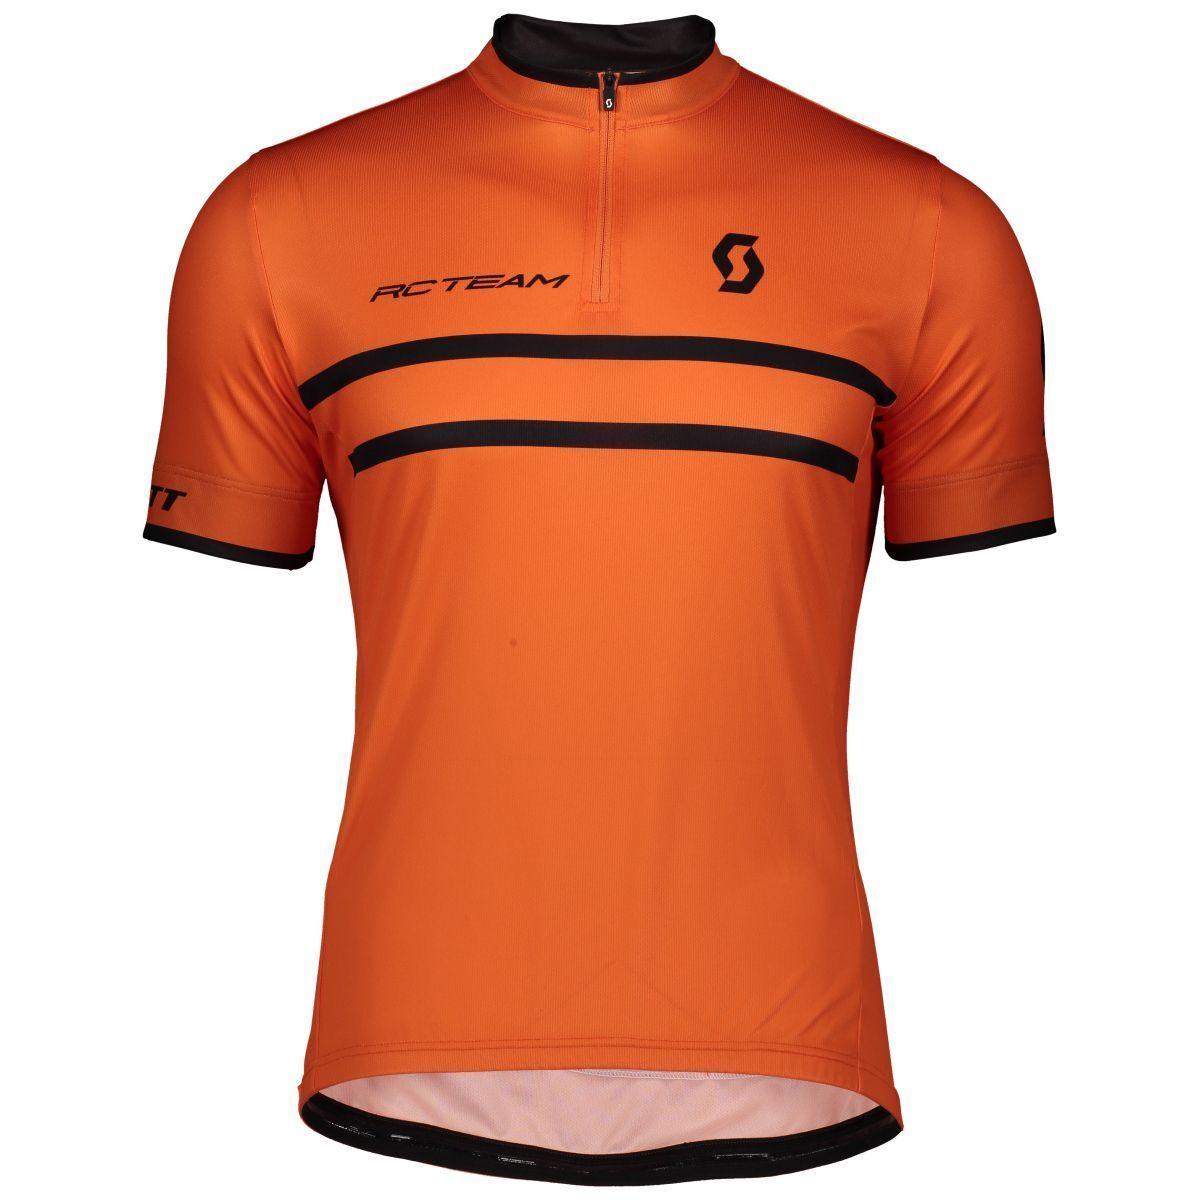 Scott RC Team 20 Fahrrad Trikot Trikot Fahrrad kurz Orange/schwarz 2019 5d87f7